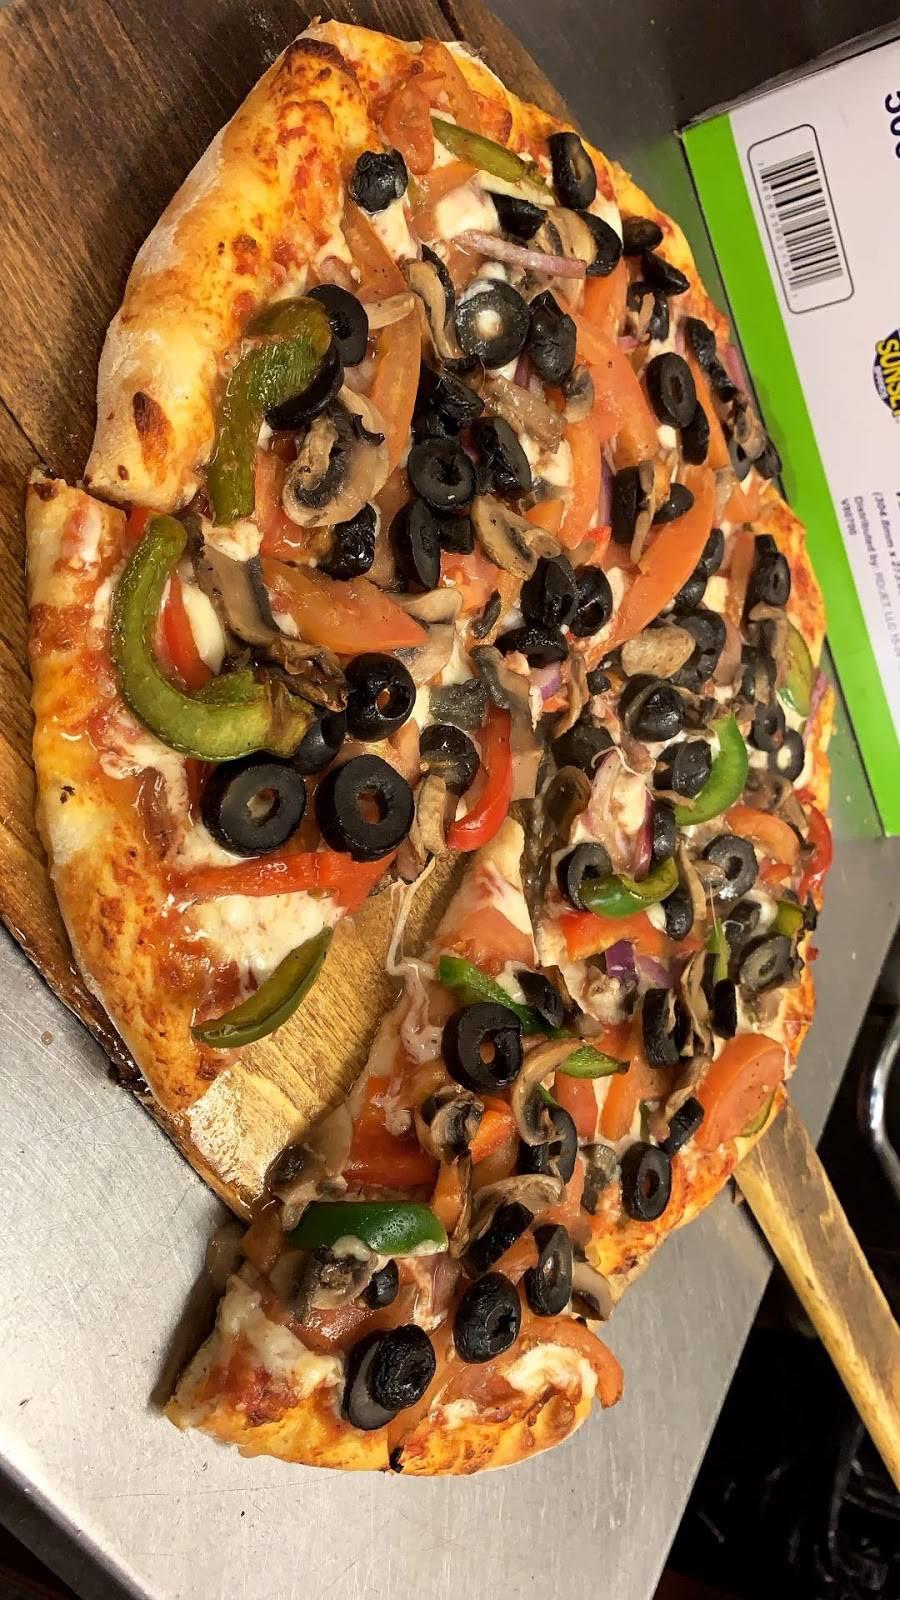 Bennys Famous Pizzeria   restaurant   3517 White Plains Rd, Bronx, NY 10467, USA   7182318746 OR +1 718-231-8746